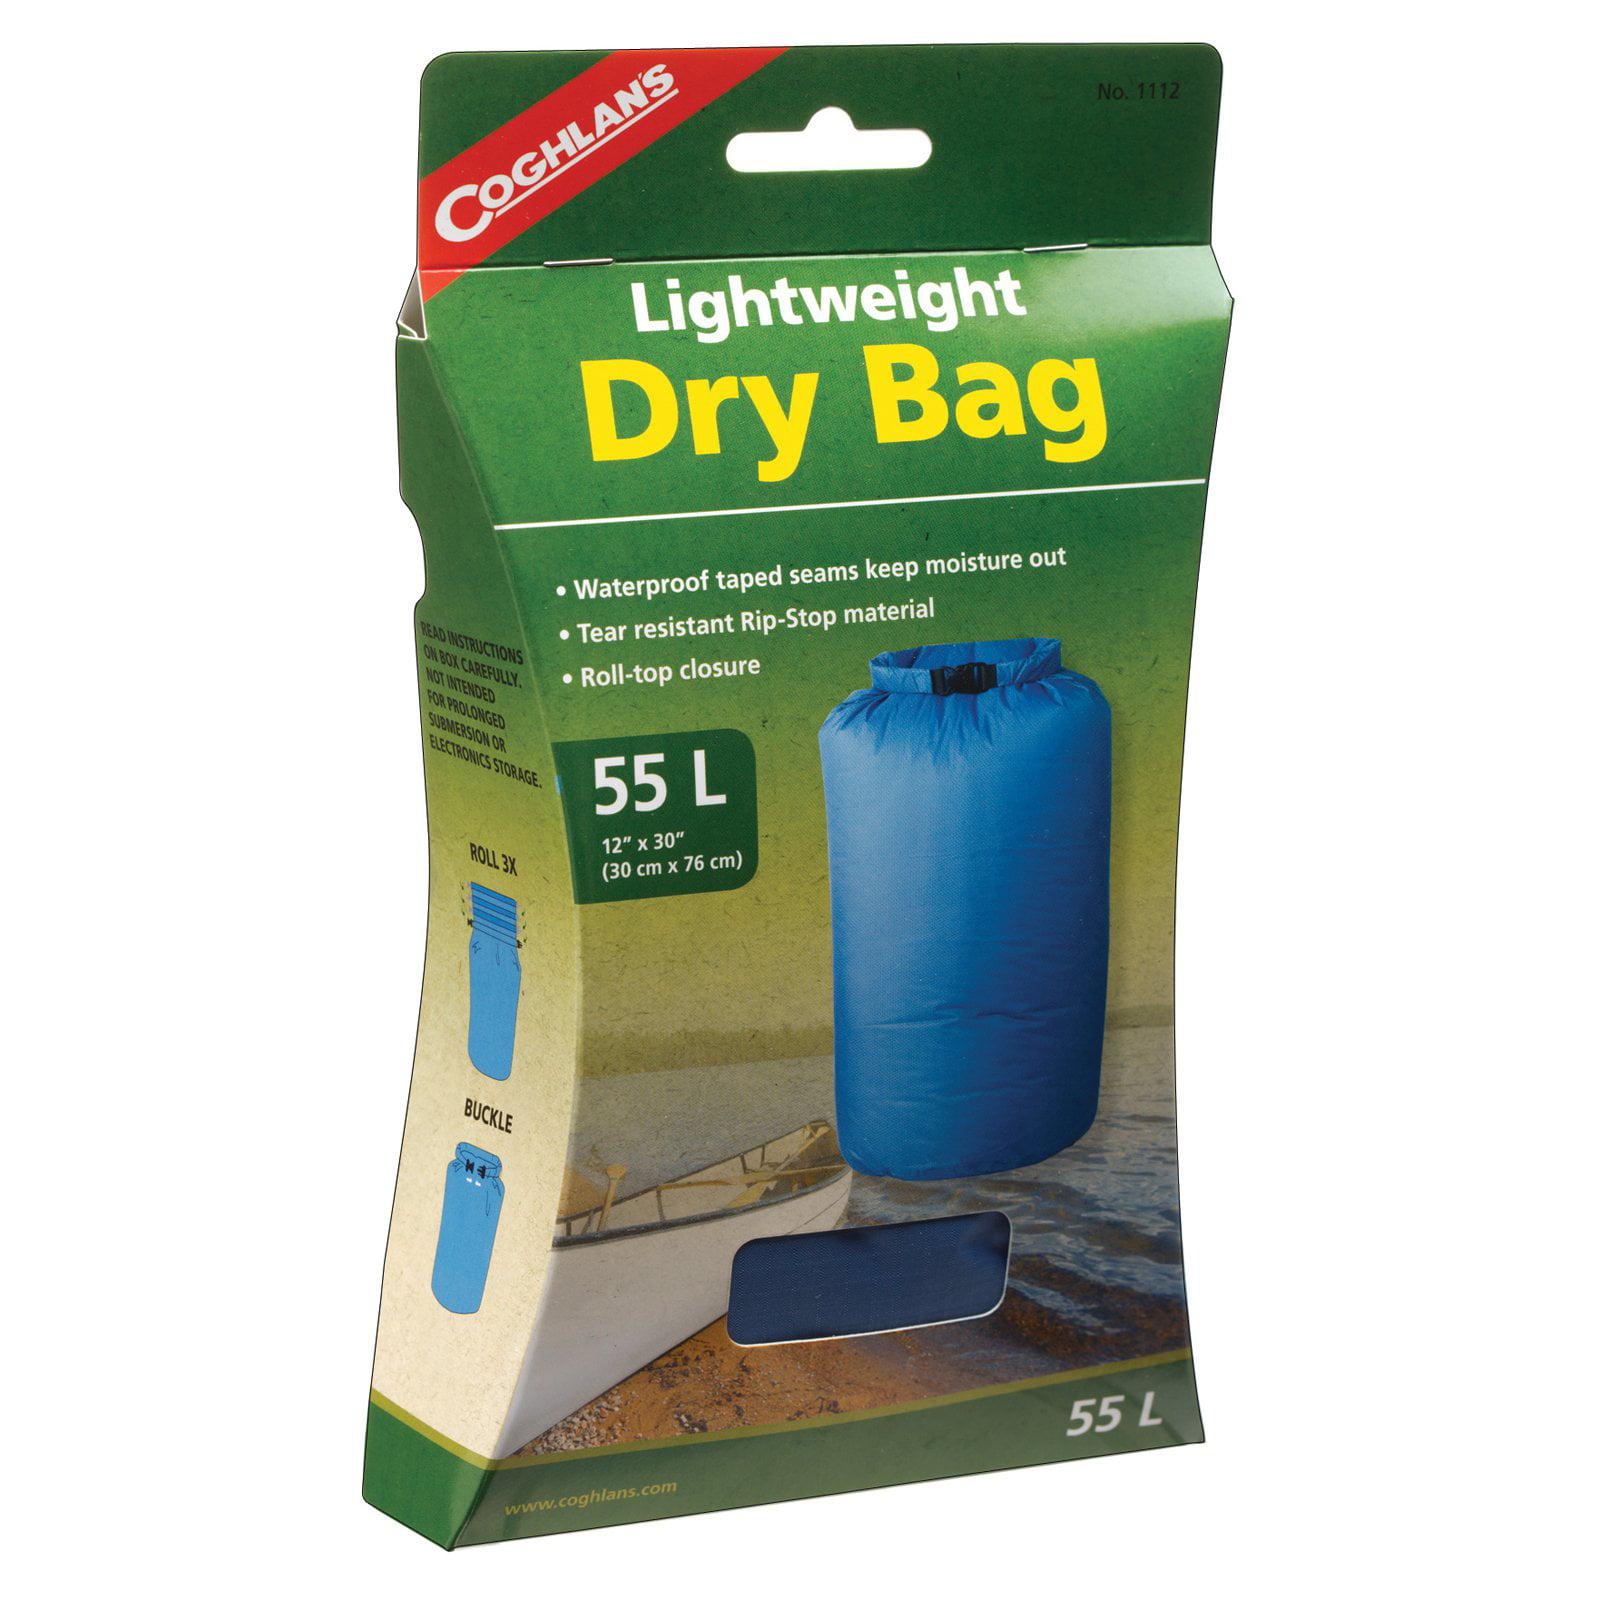 Coghlan's 1112 55 Liter Lightweight Dry Bag